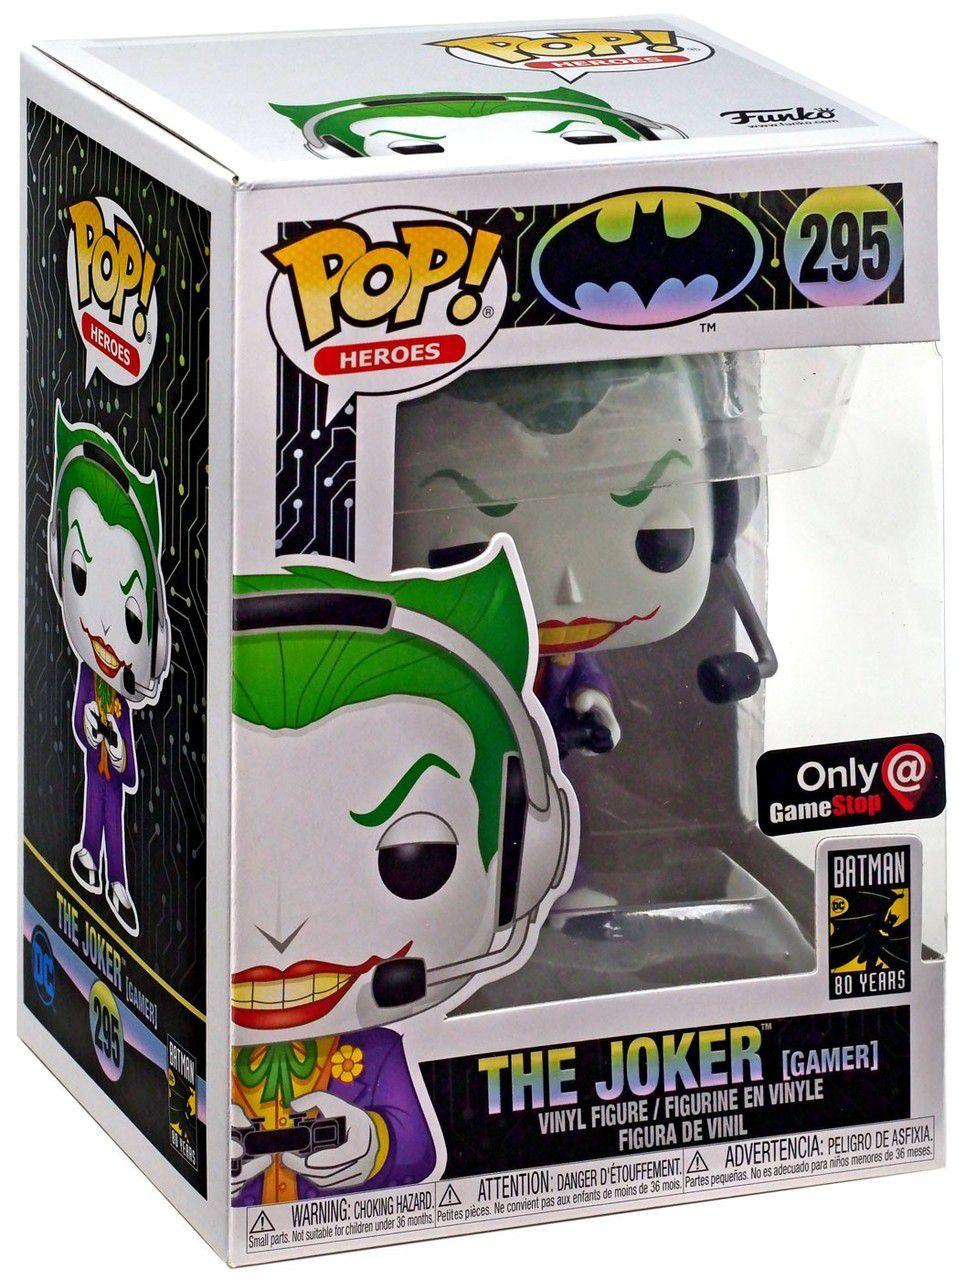 Funko Pop! Coringa (The Joker Gamer): DC Comics (Exclusivo) #295 - Funko